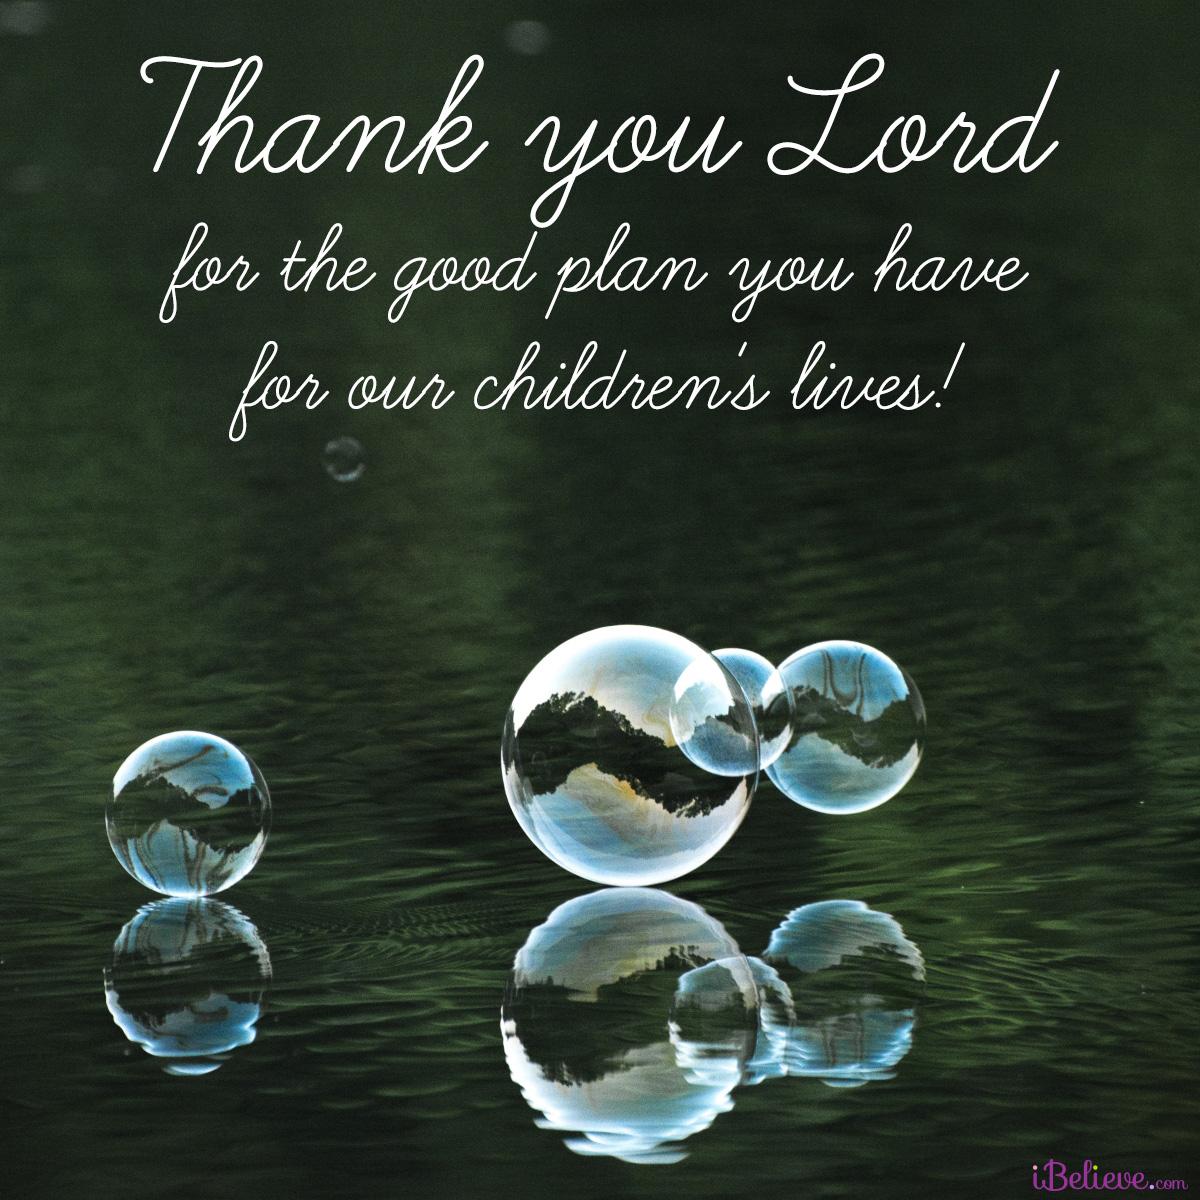 a prayer for our childrens lives, inspirational image